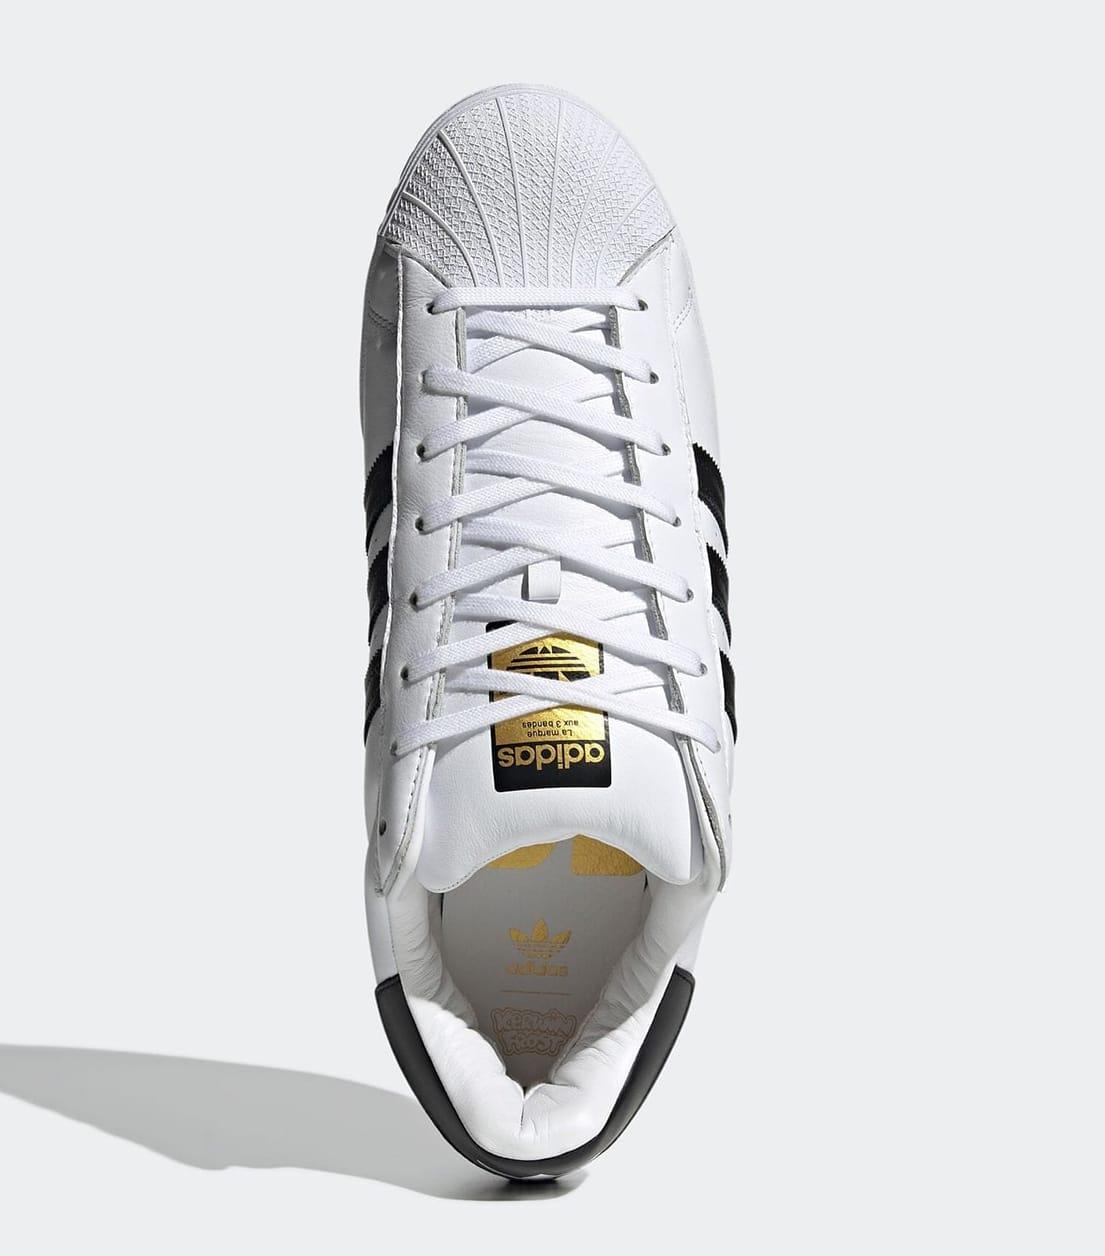 Kerwin Frost x Adidas Superstar 'Superstuffed' GY5167 Top